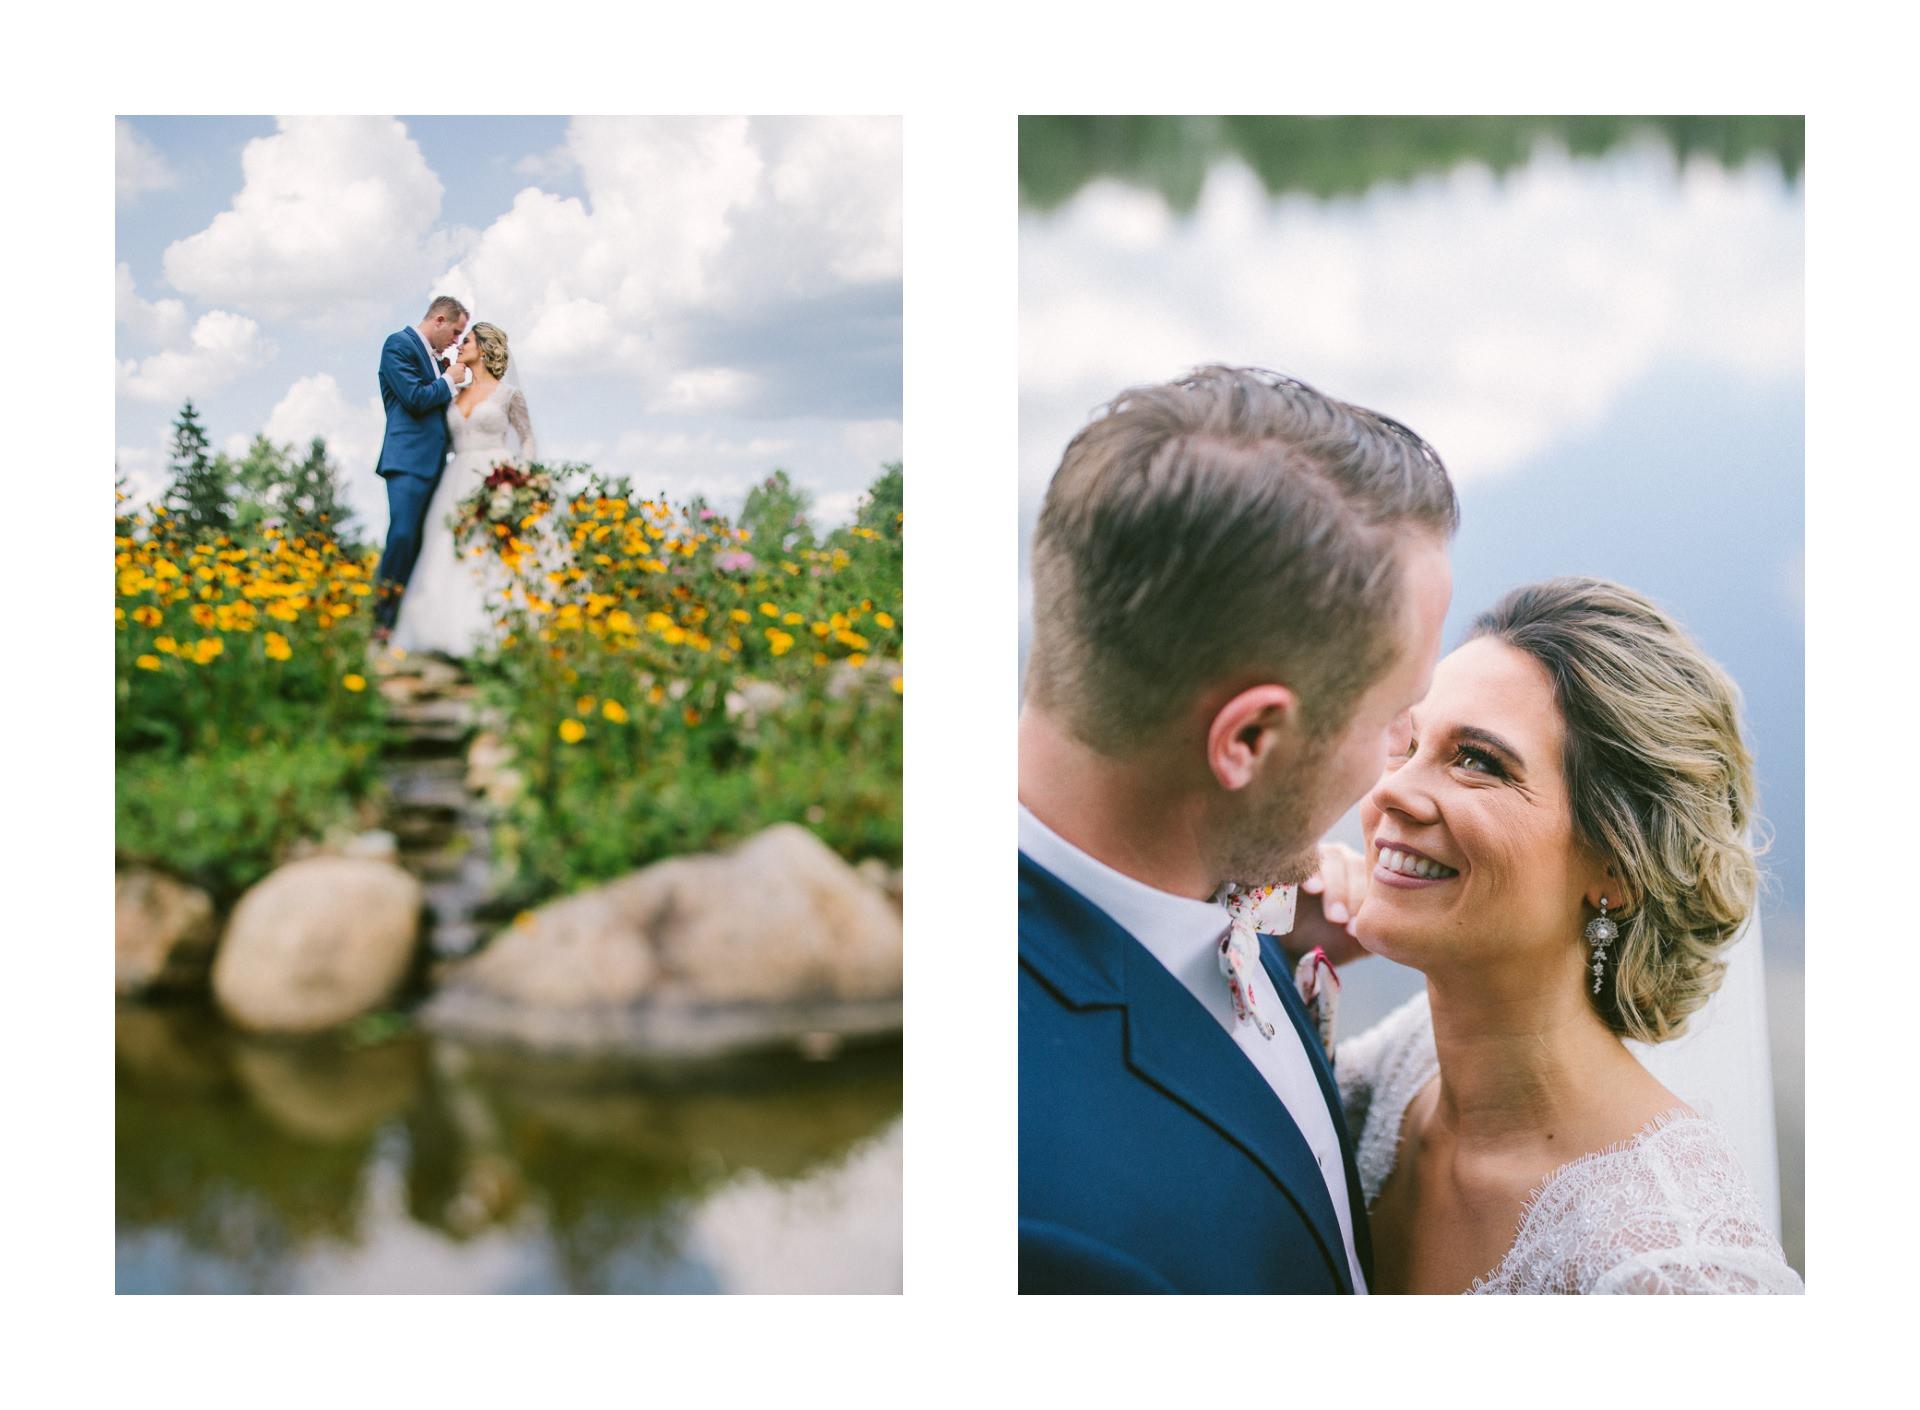 Meadow Ridge Farm Wedding Photos in Windsor 1 33.jpg